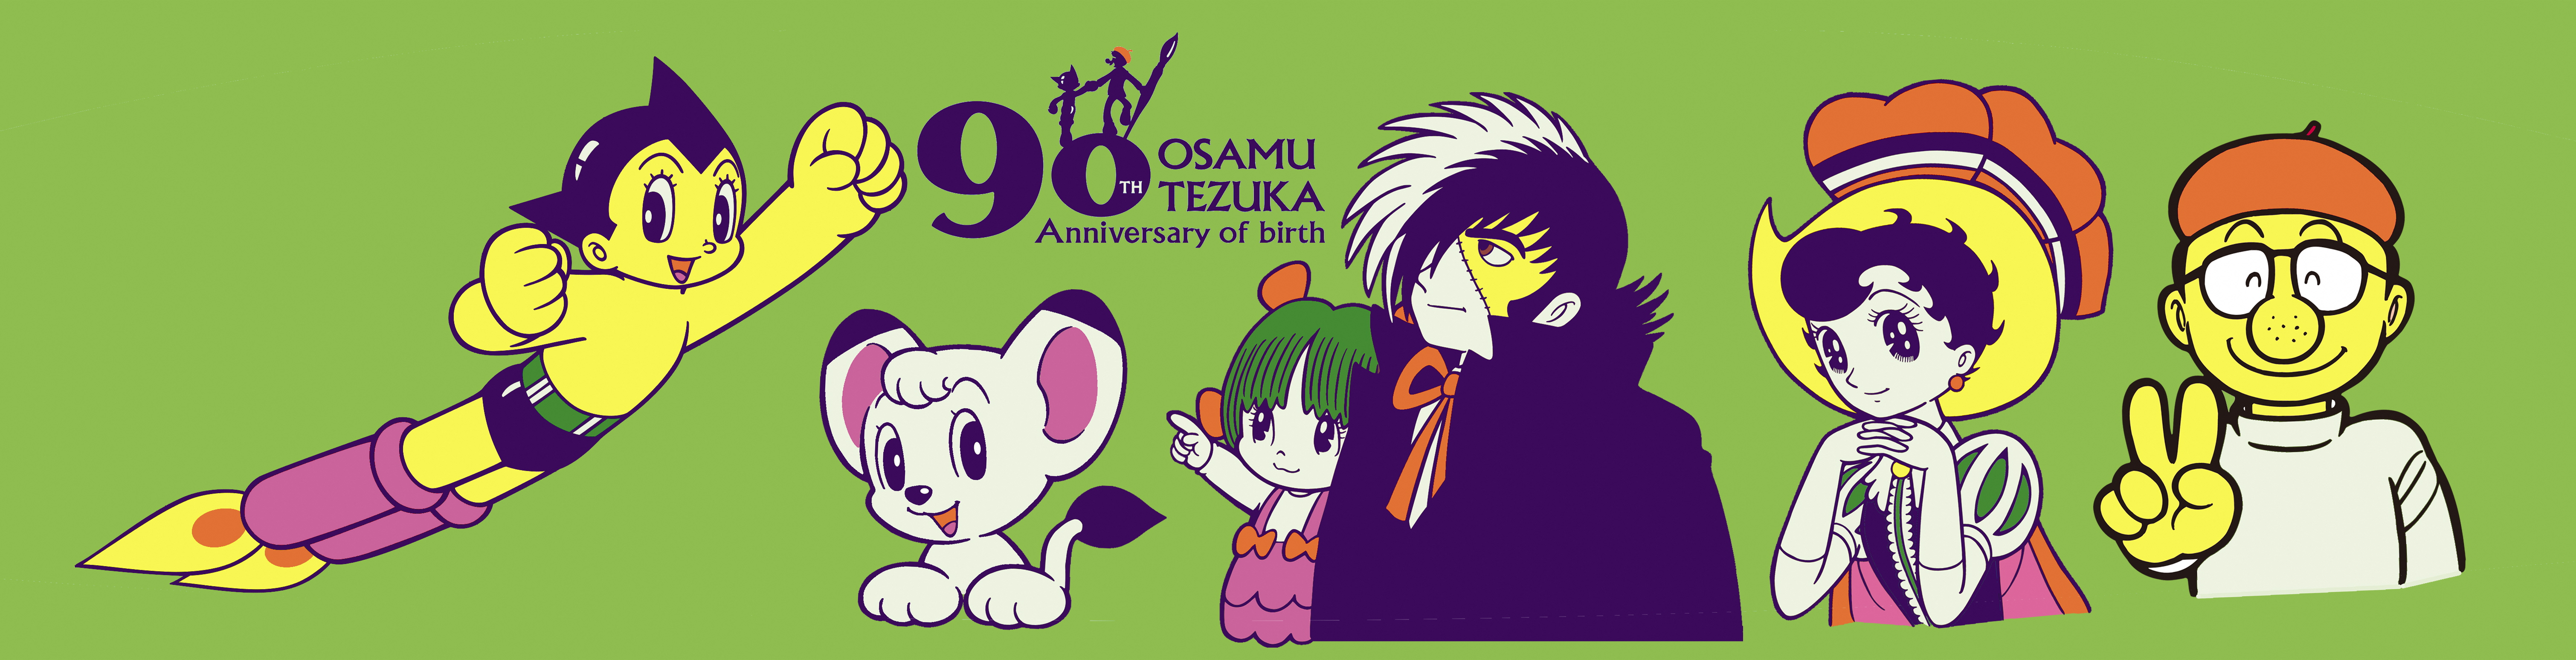 H30第2_手塚治虫キャラクター©TEZUKA PRODUCTIONS.jpg